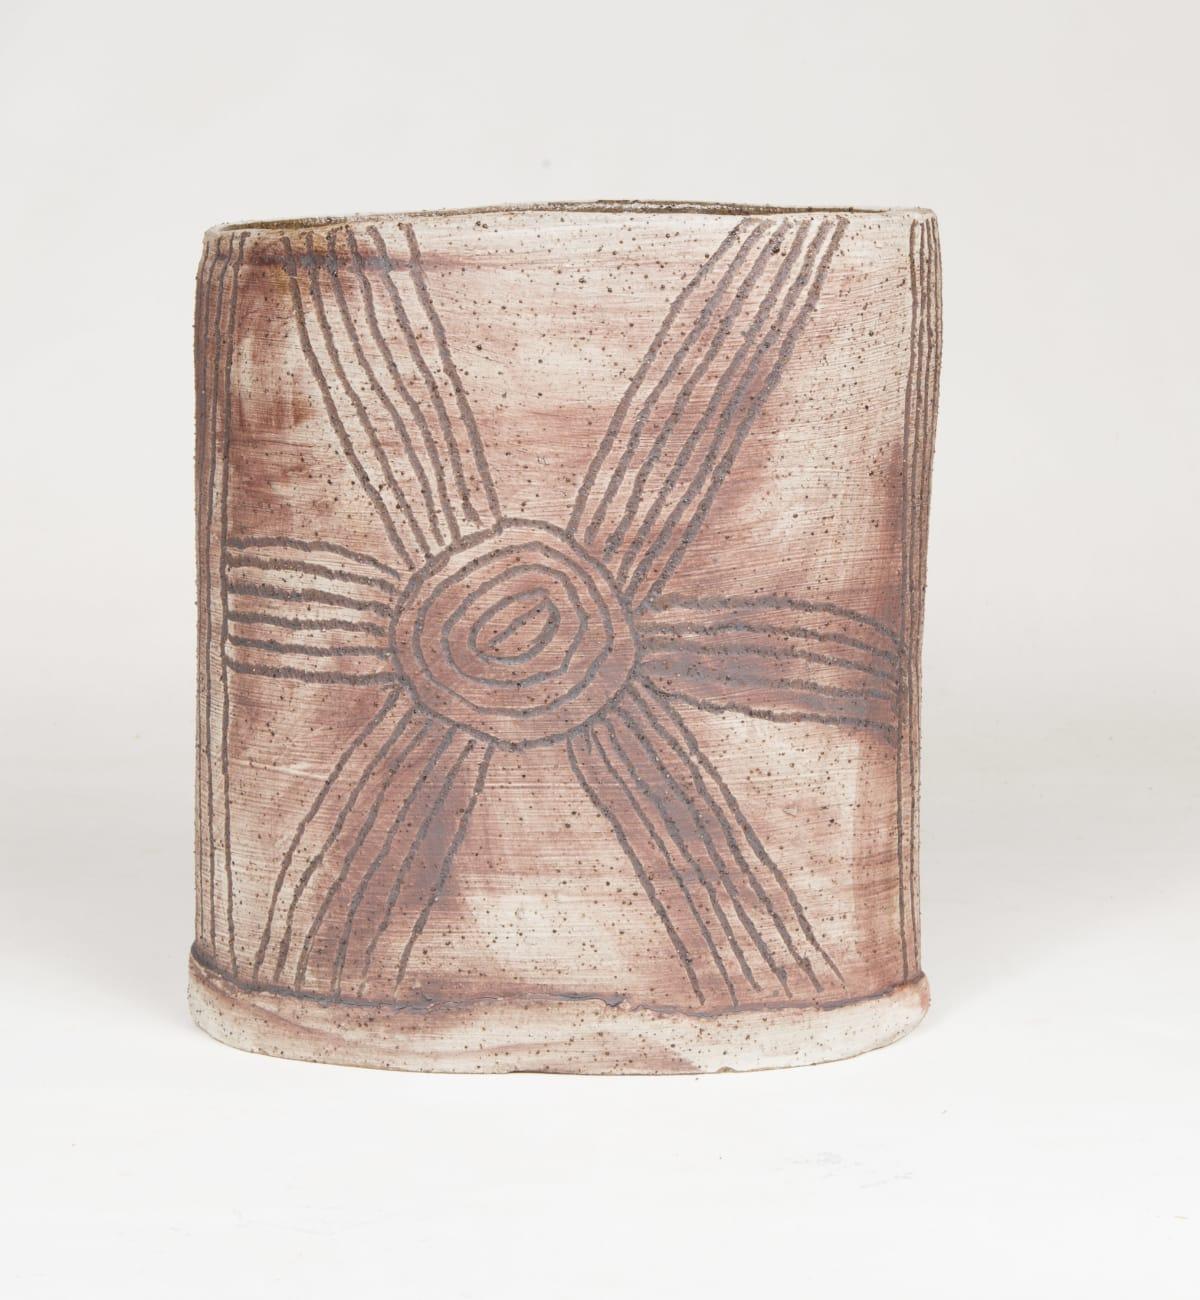 Rupert Jack Maku Maku, 2018 Stoneware 26 x 23 cm